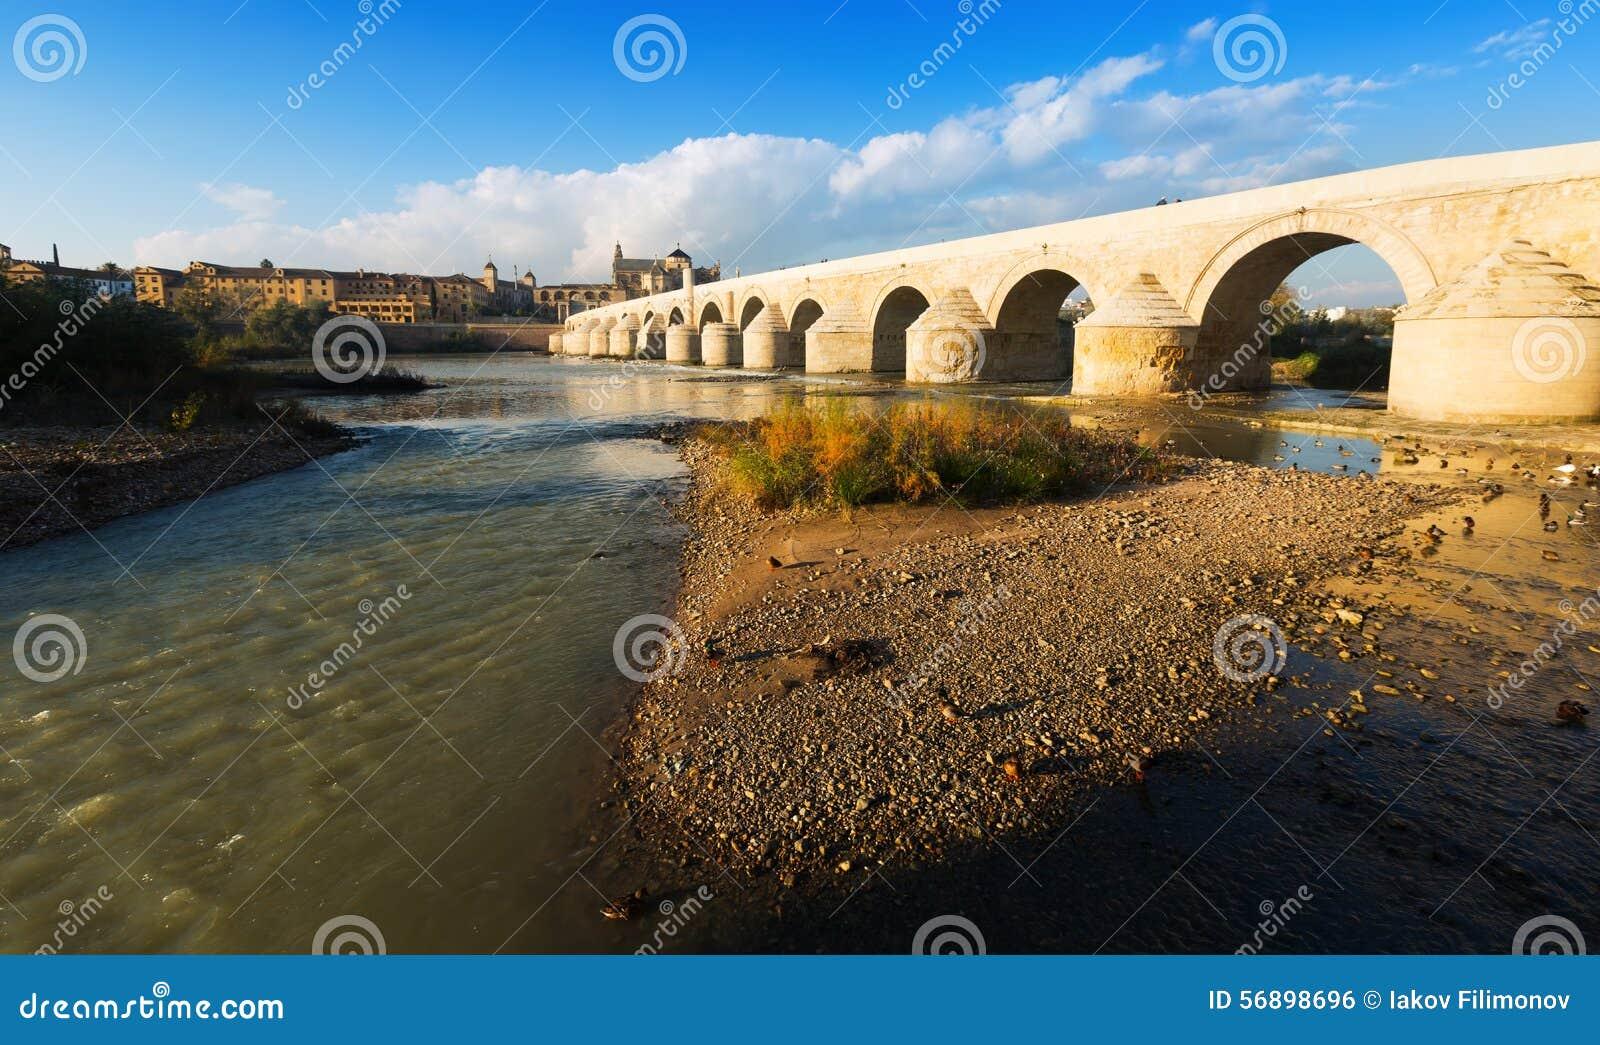 Ancient stone bridge over Guadalquivir river in Cordoba